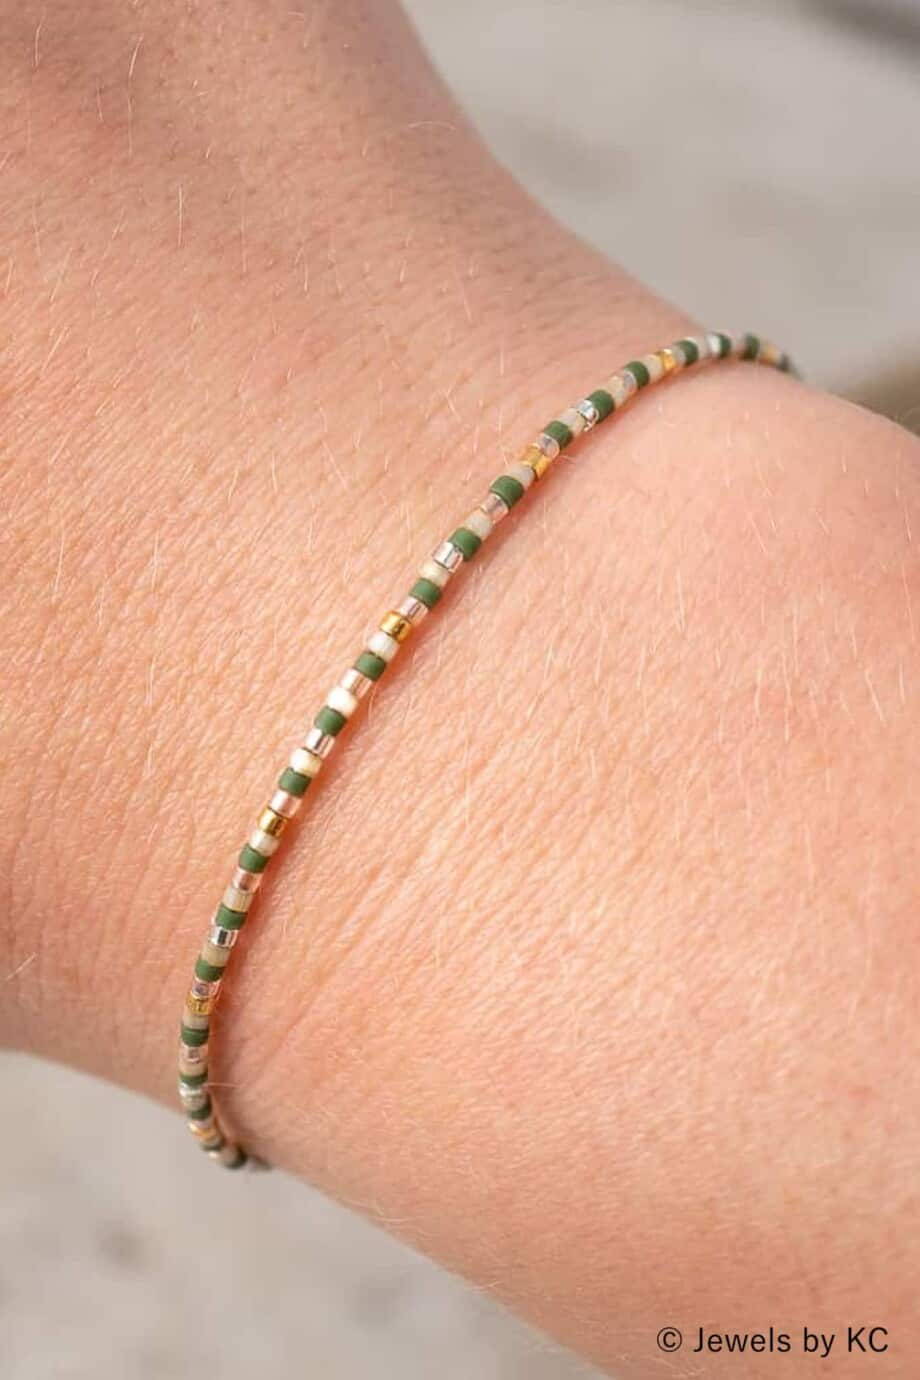 Handgemaakt-Miyuki-armbandje-Pastel-green-gold-kralen-armbandje